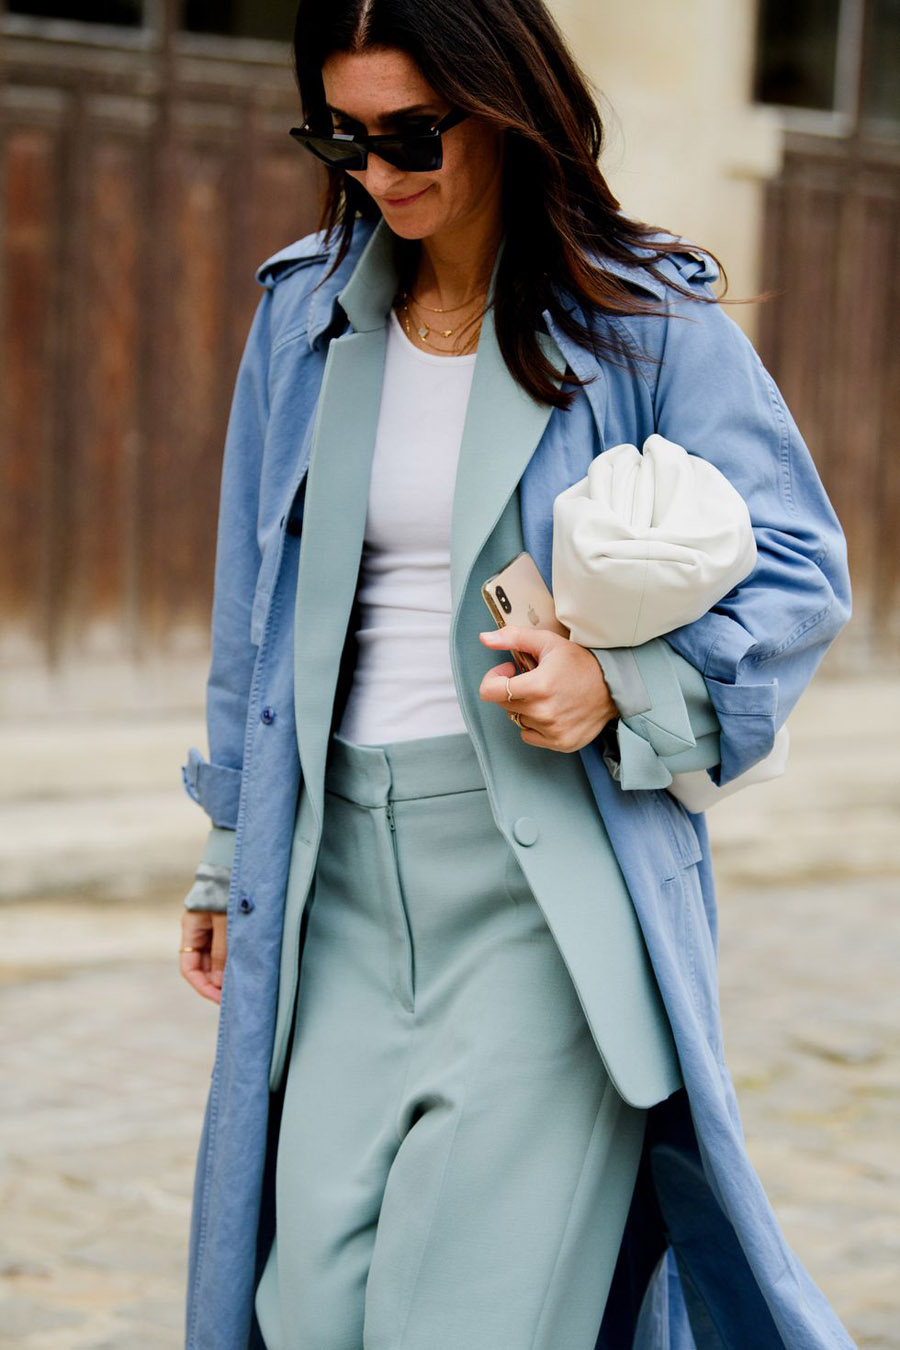 paris-fashion-week-pfw-street-style-ss20-day-6-by-tyler-joe-041-1569835083